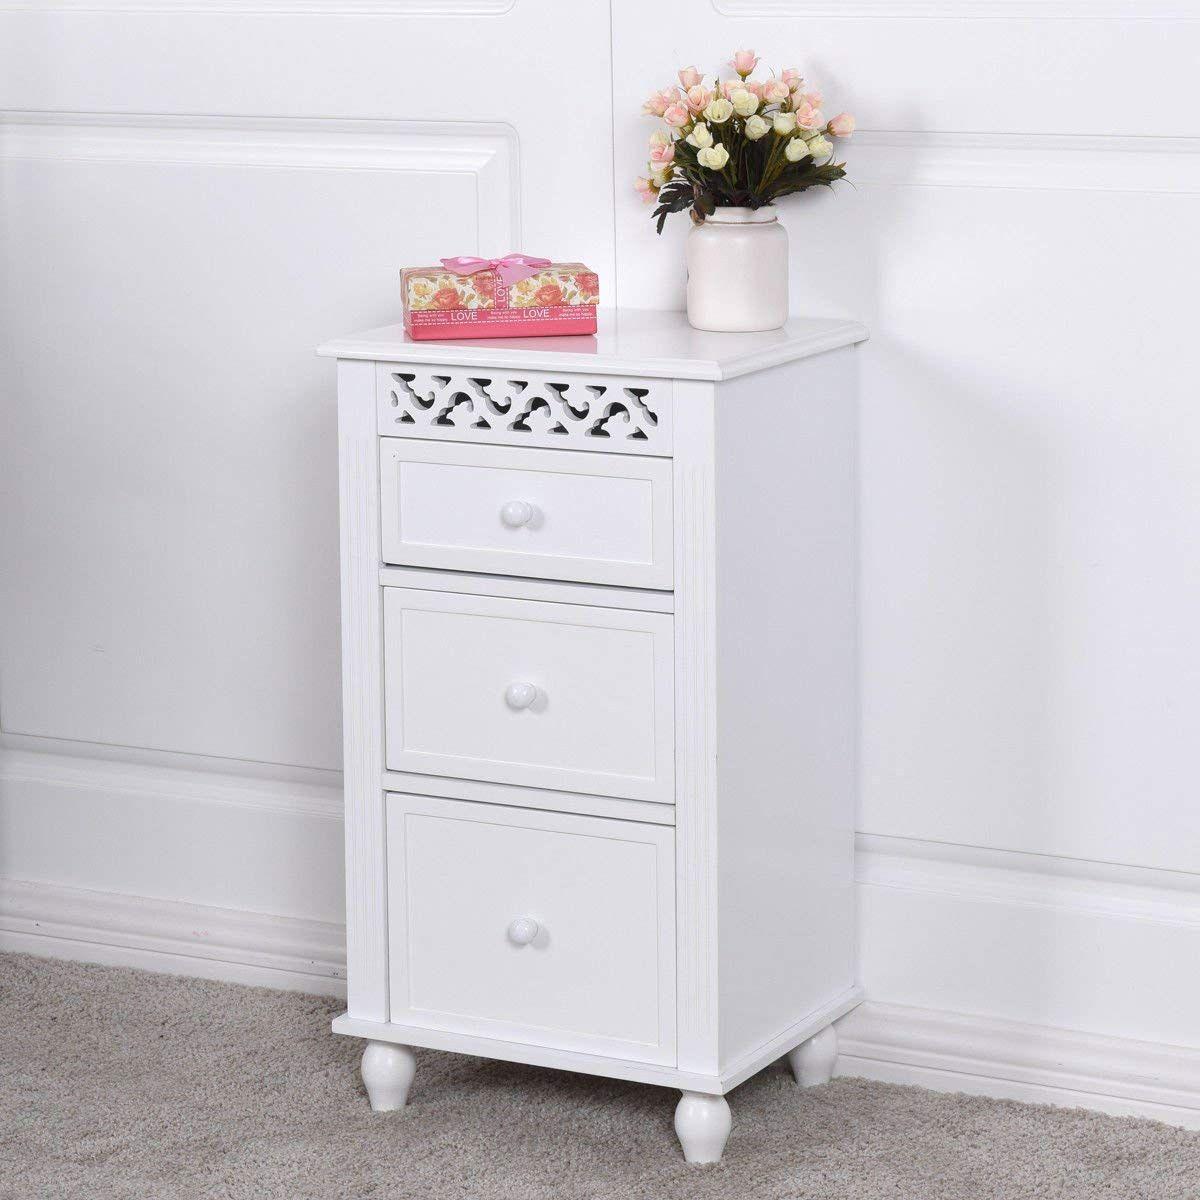 White Small Floor Cabinet Wood Bathroom White Storage Cabinets Cupboards Organization